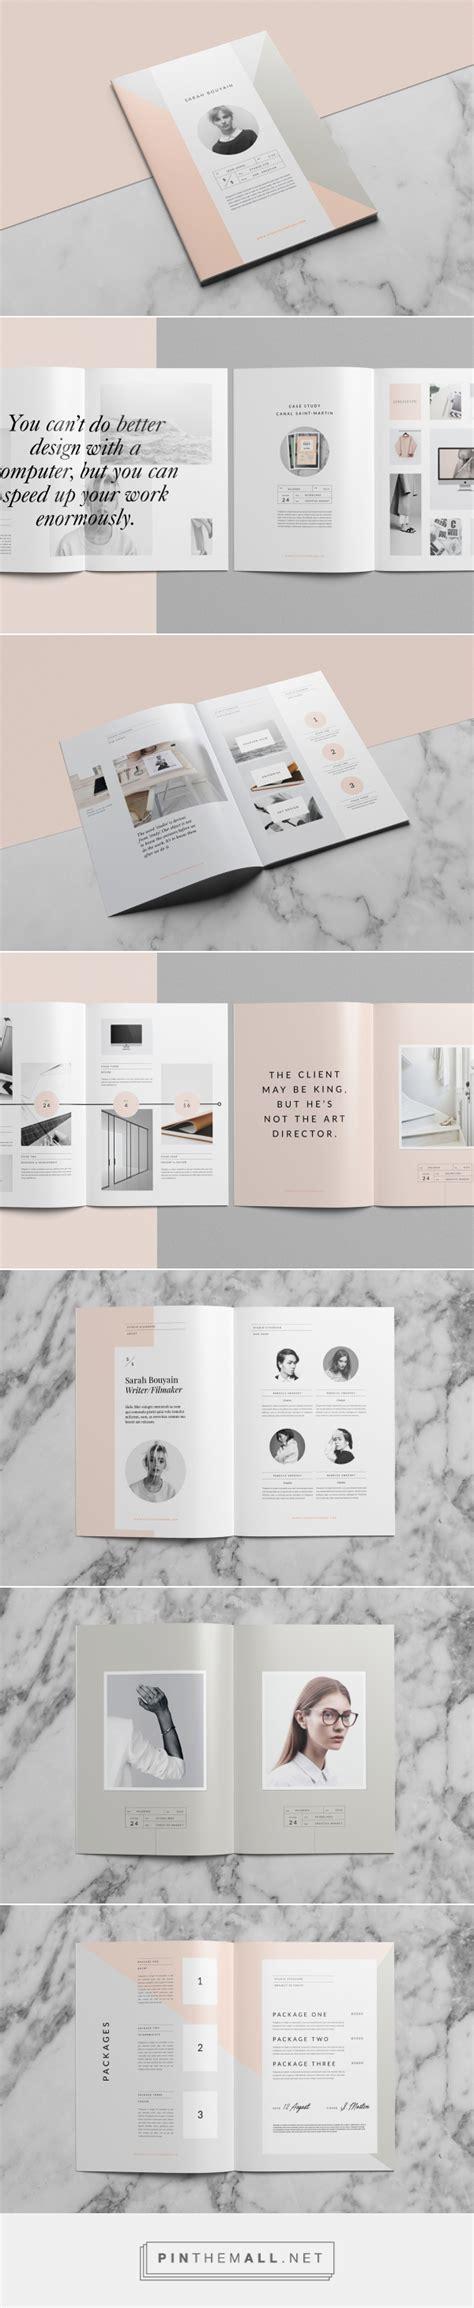 portfolio layout behance saint martin proposal on behance a grouped images